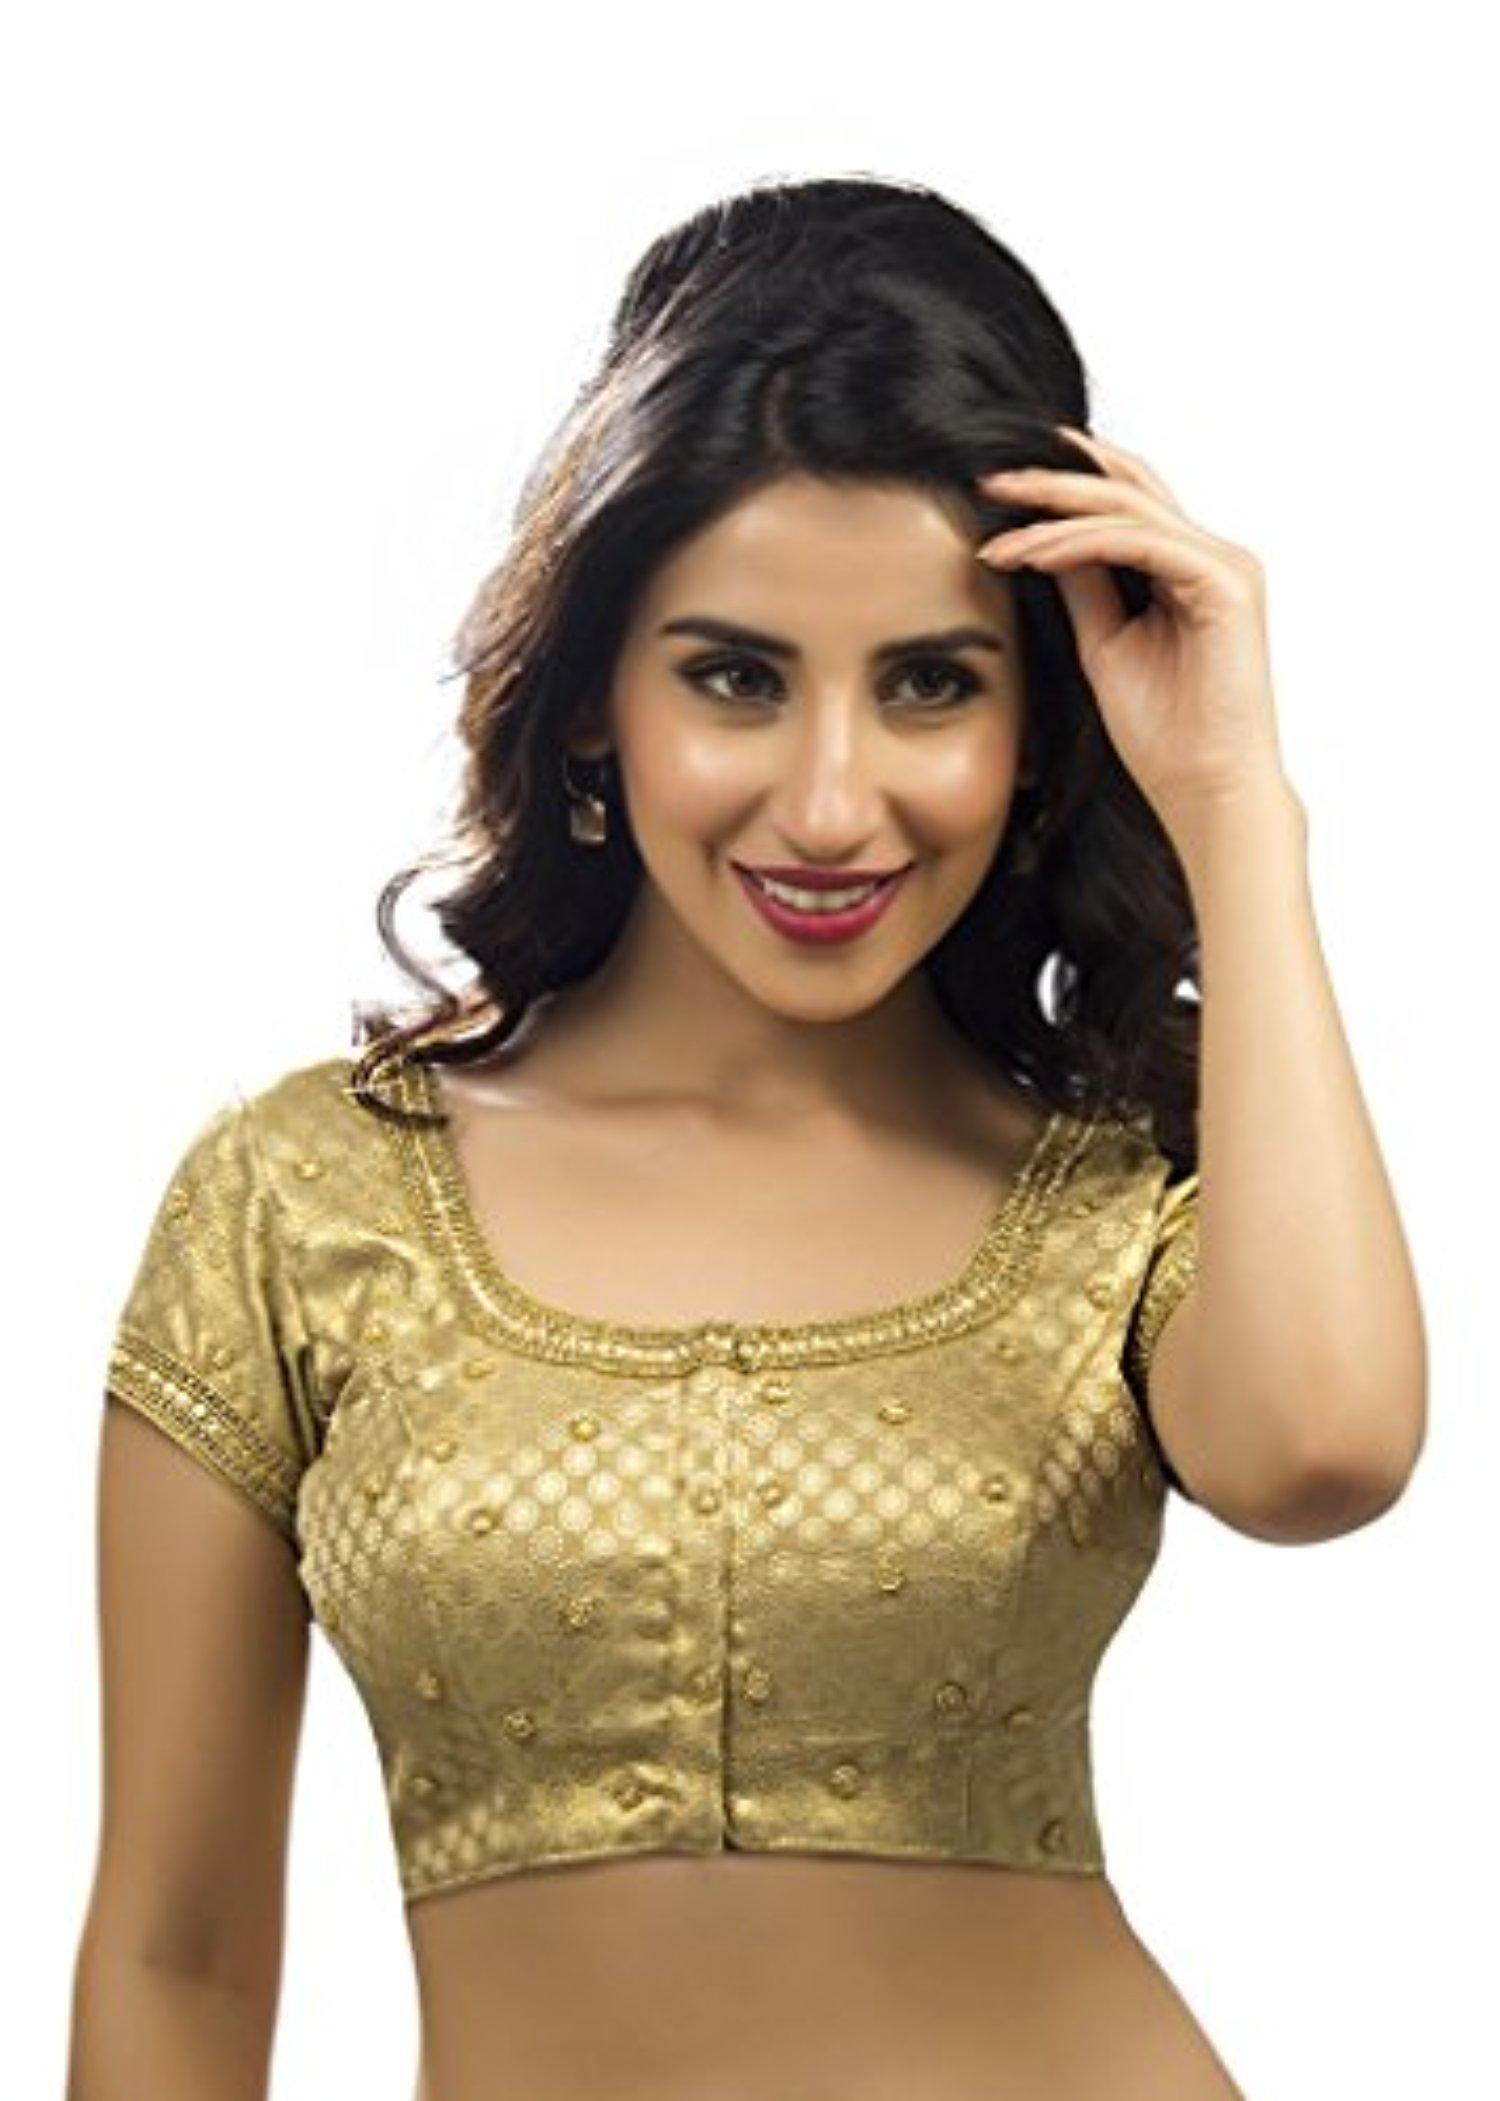 e0909b8d76c72 Bollywood Blouses Women s Designer Simple Gold Motif Saree Blouse Medium  Gold - Brought to you by Avarsha.com